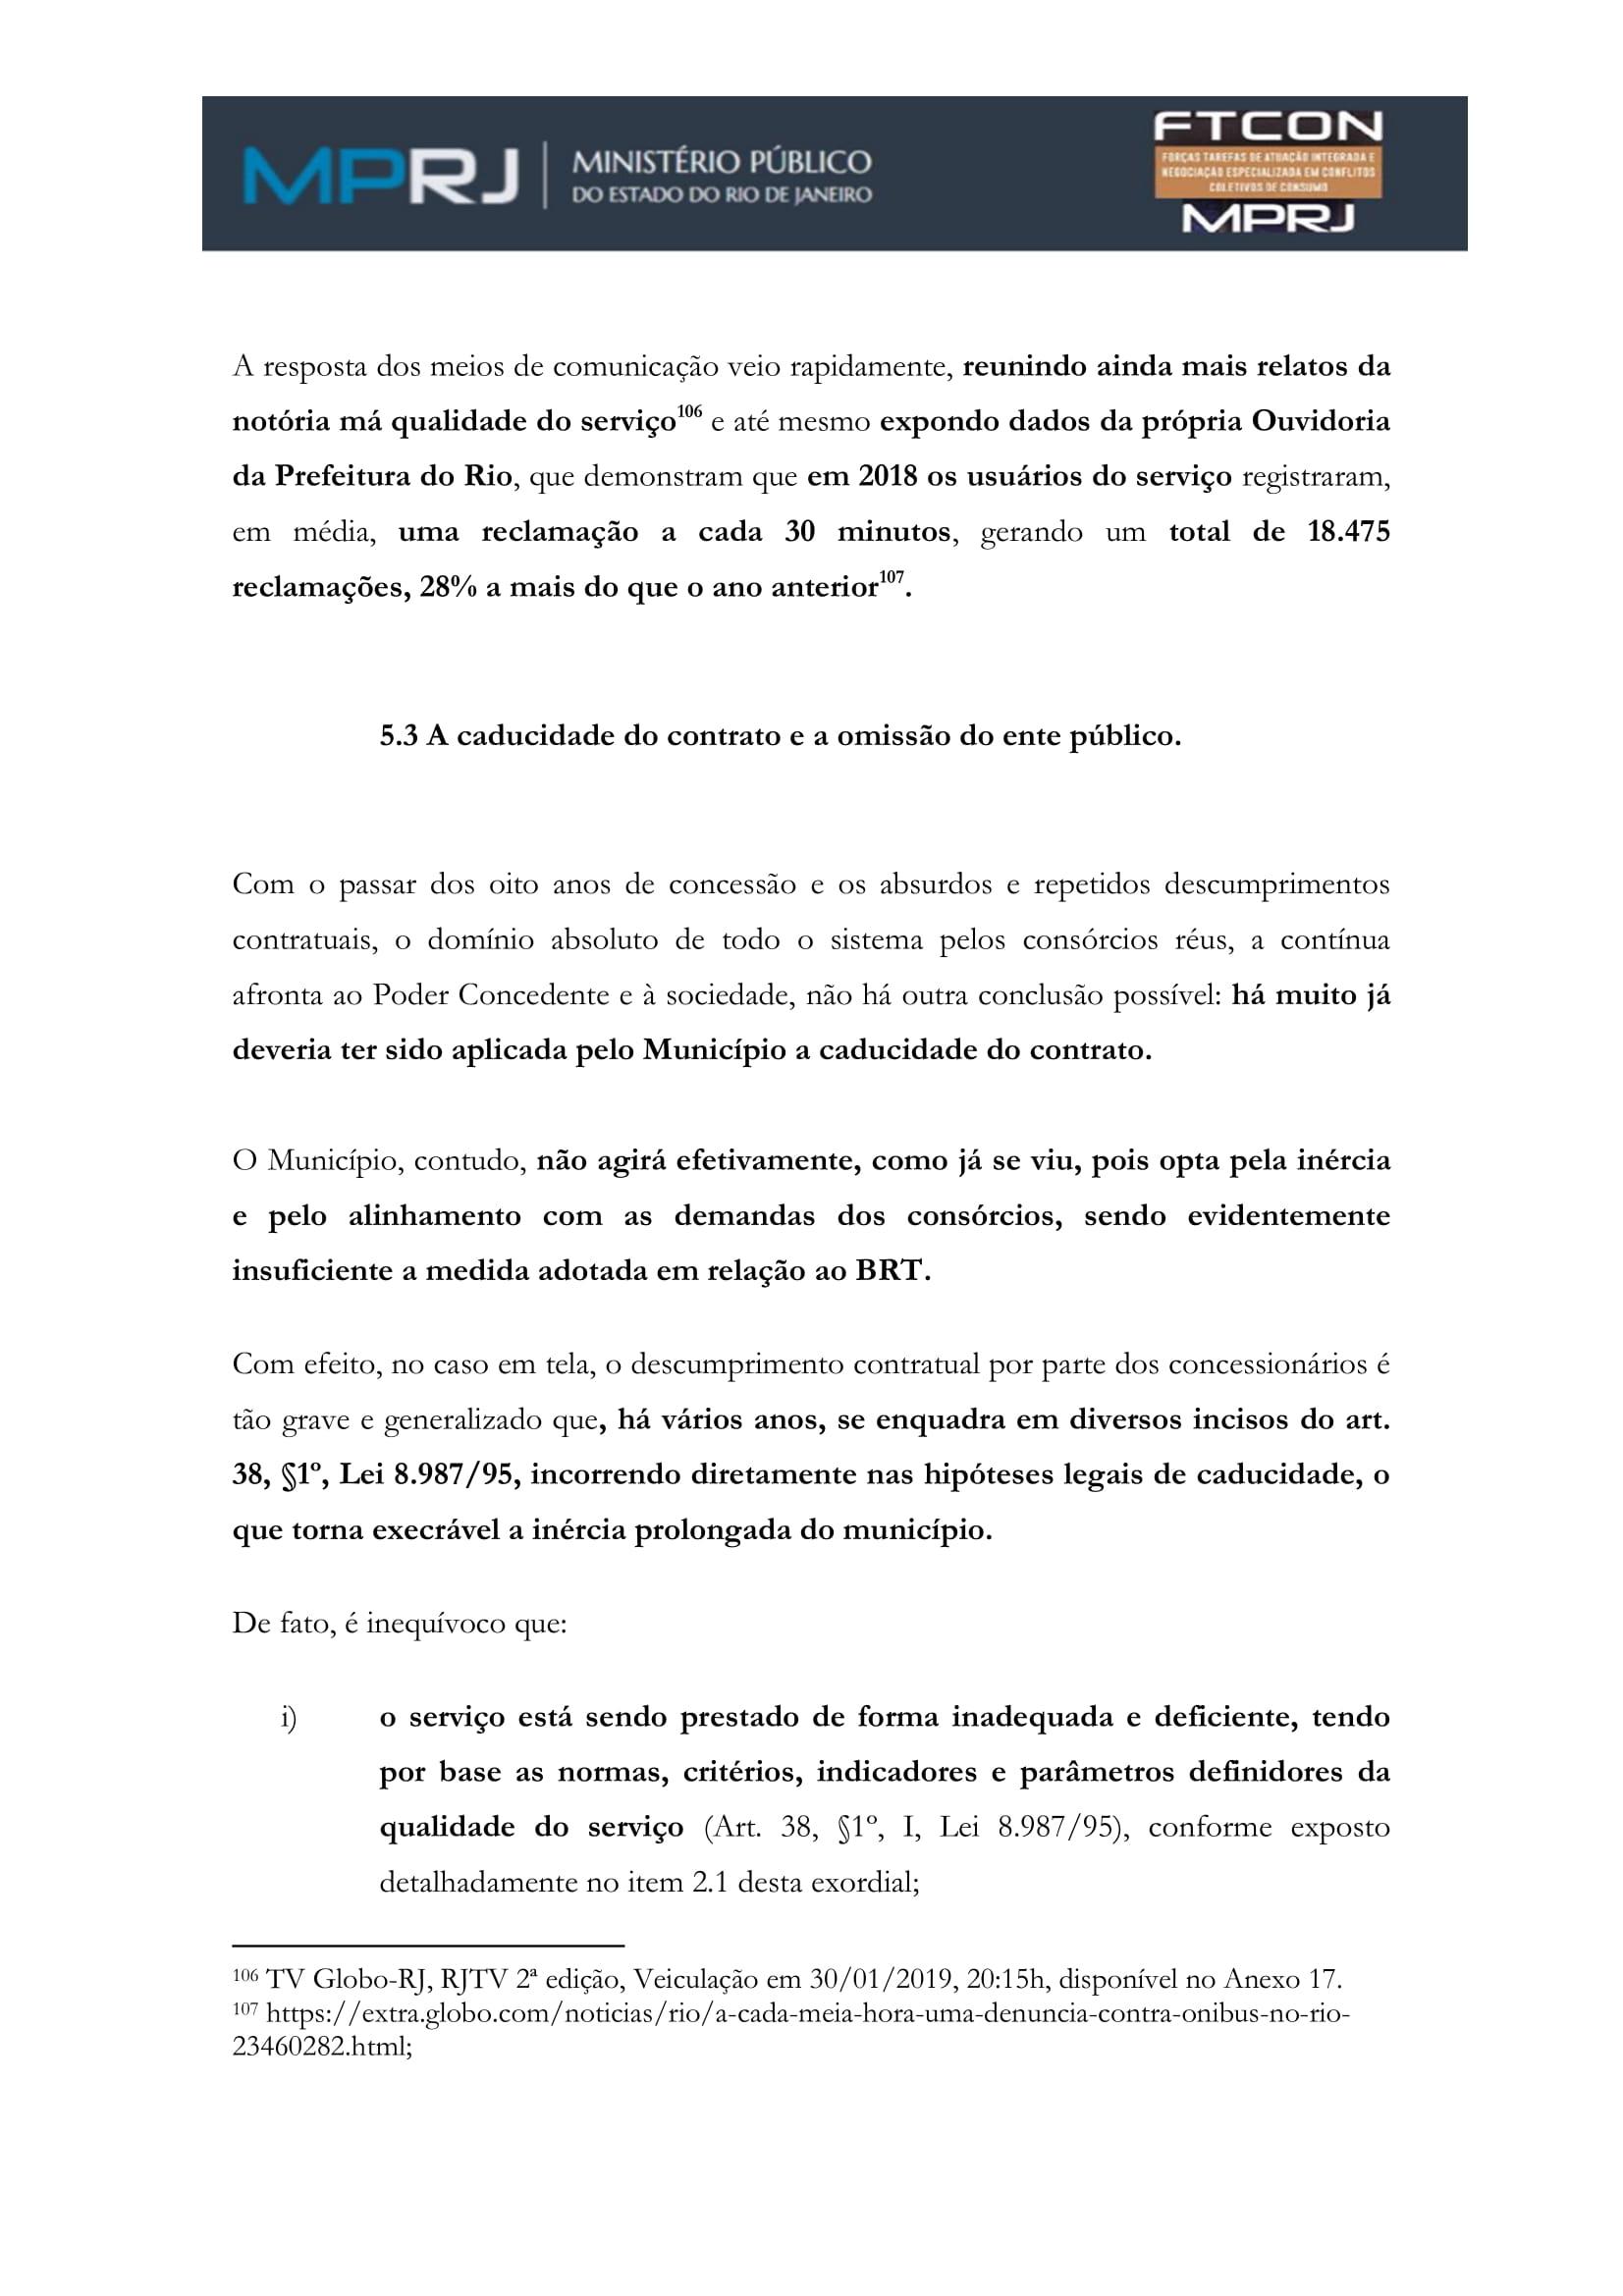 acp_caducidade_onibus_dr_rt-113